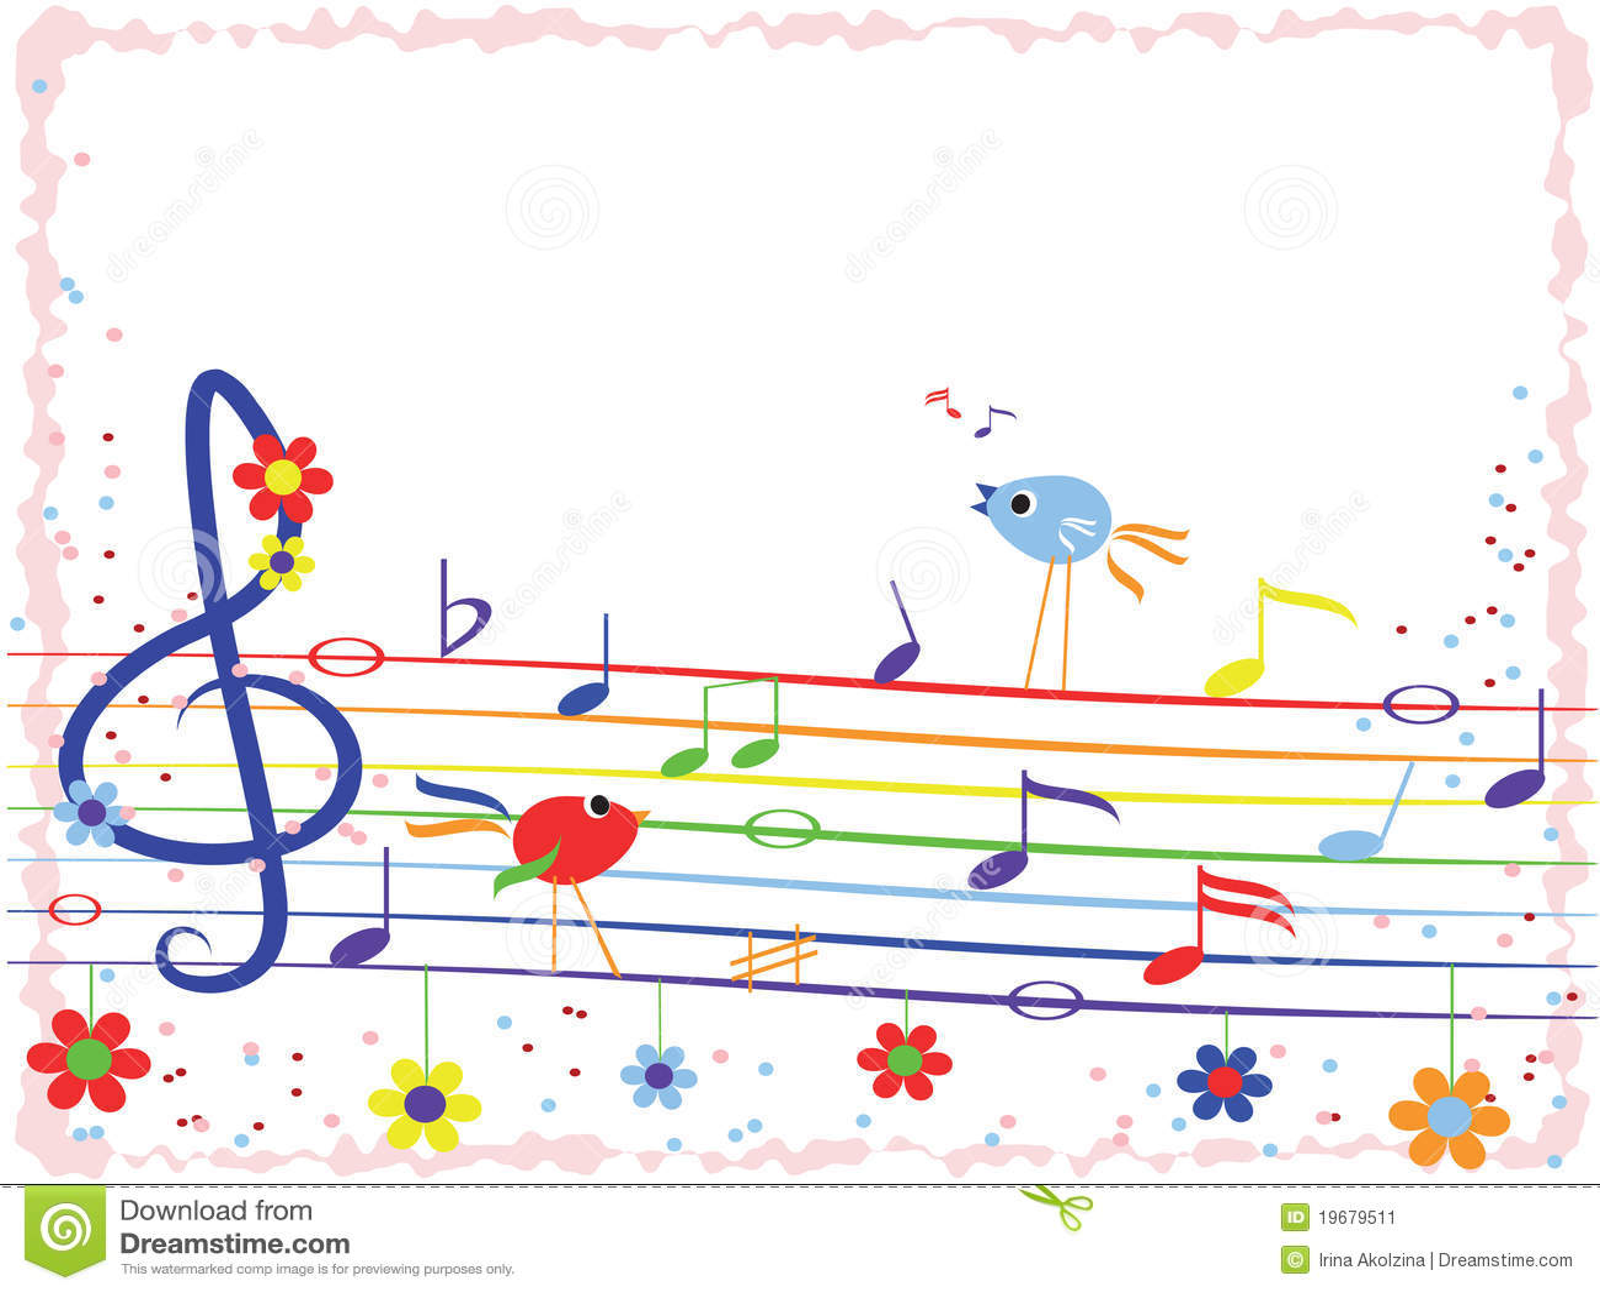 music notes frame stock image image 19679511 free clipart music notes symbols Cartoon Music Notes and Symbols